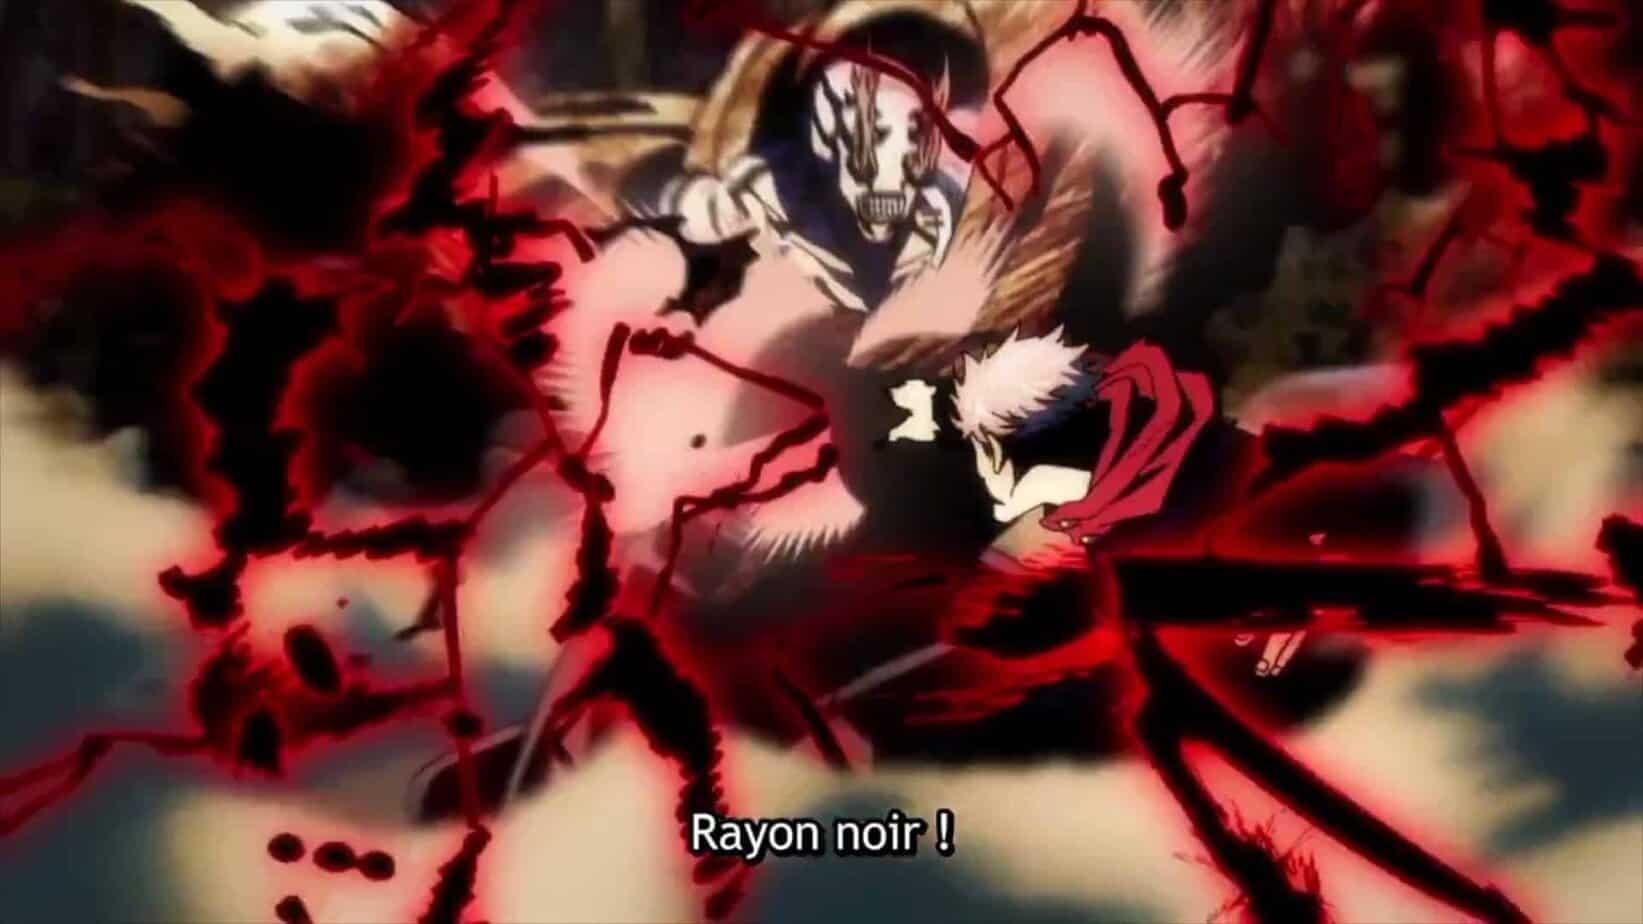 Revue du Jujutsu Kaisen Episode 19 : Itadori apprend le Rayon Noir 1